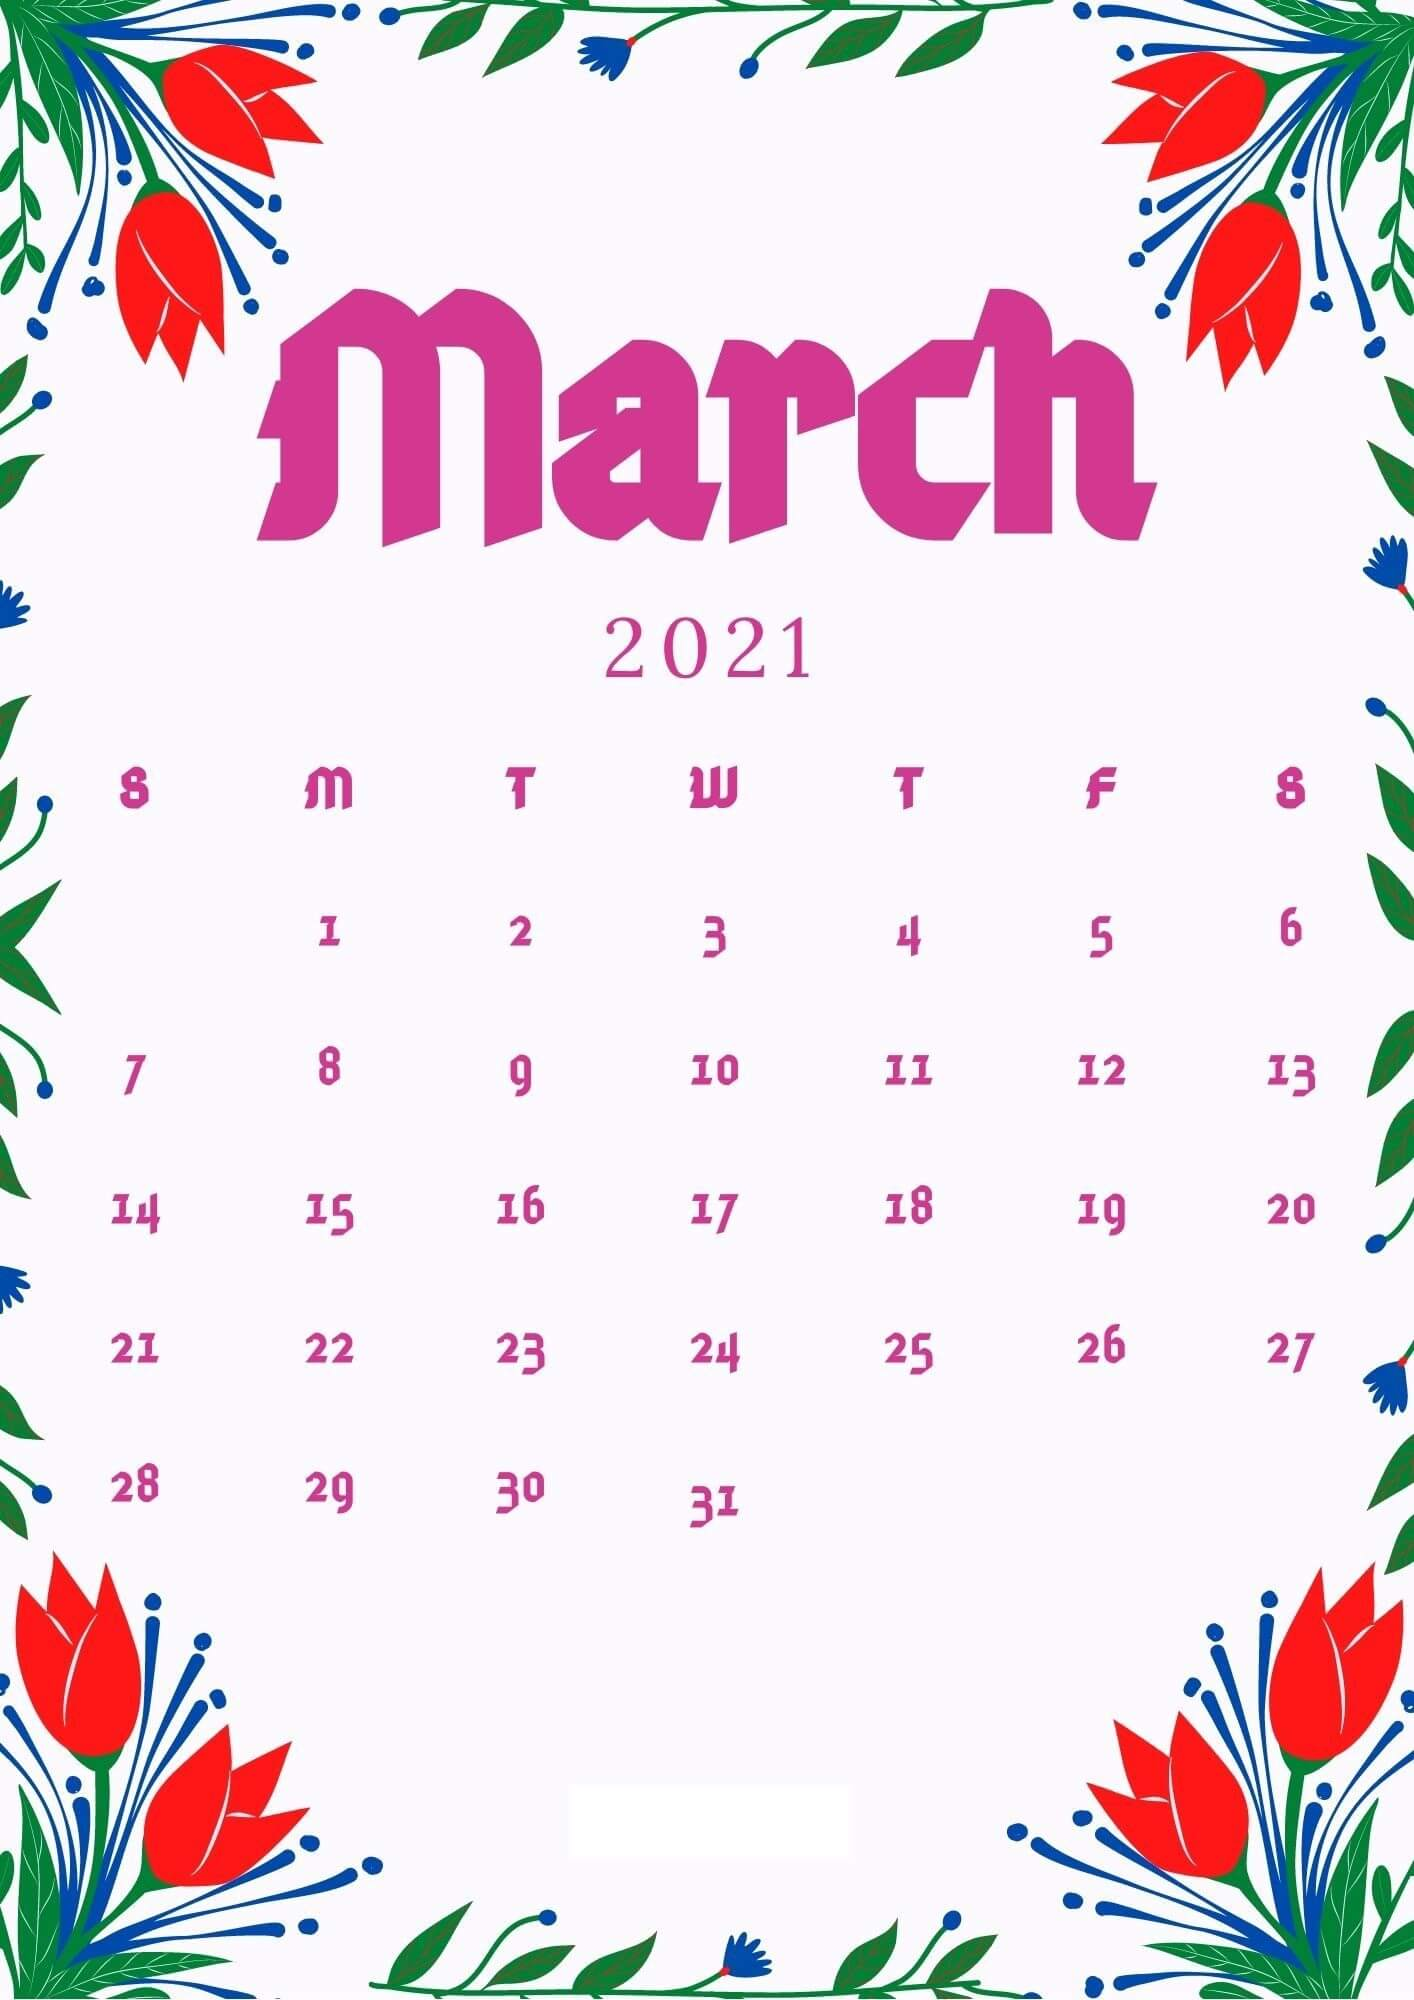 Free March 2021 Floral Calendar